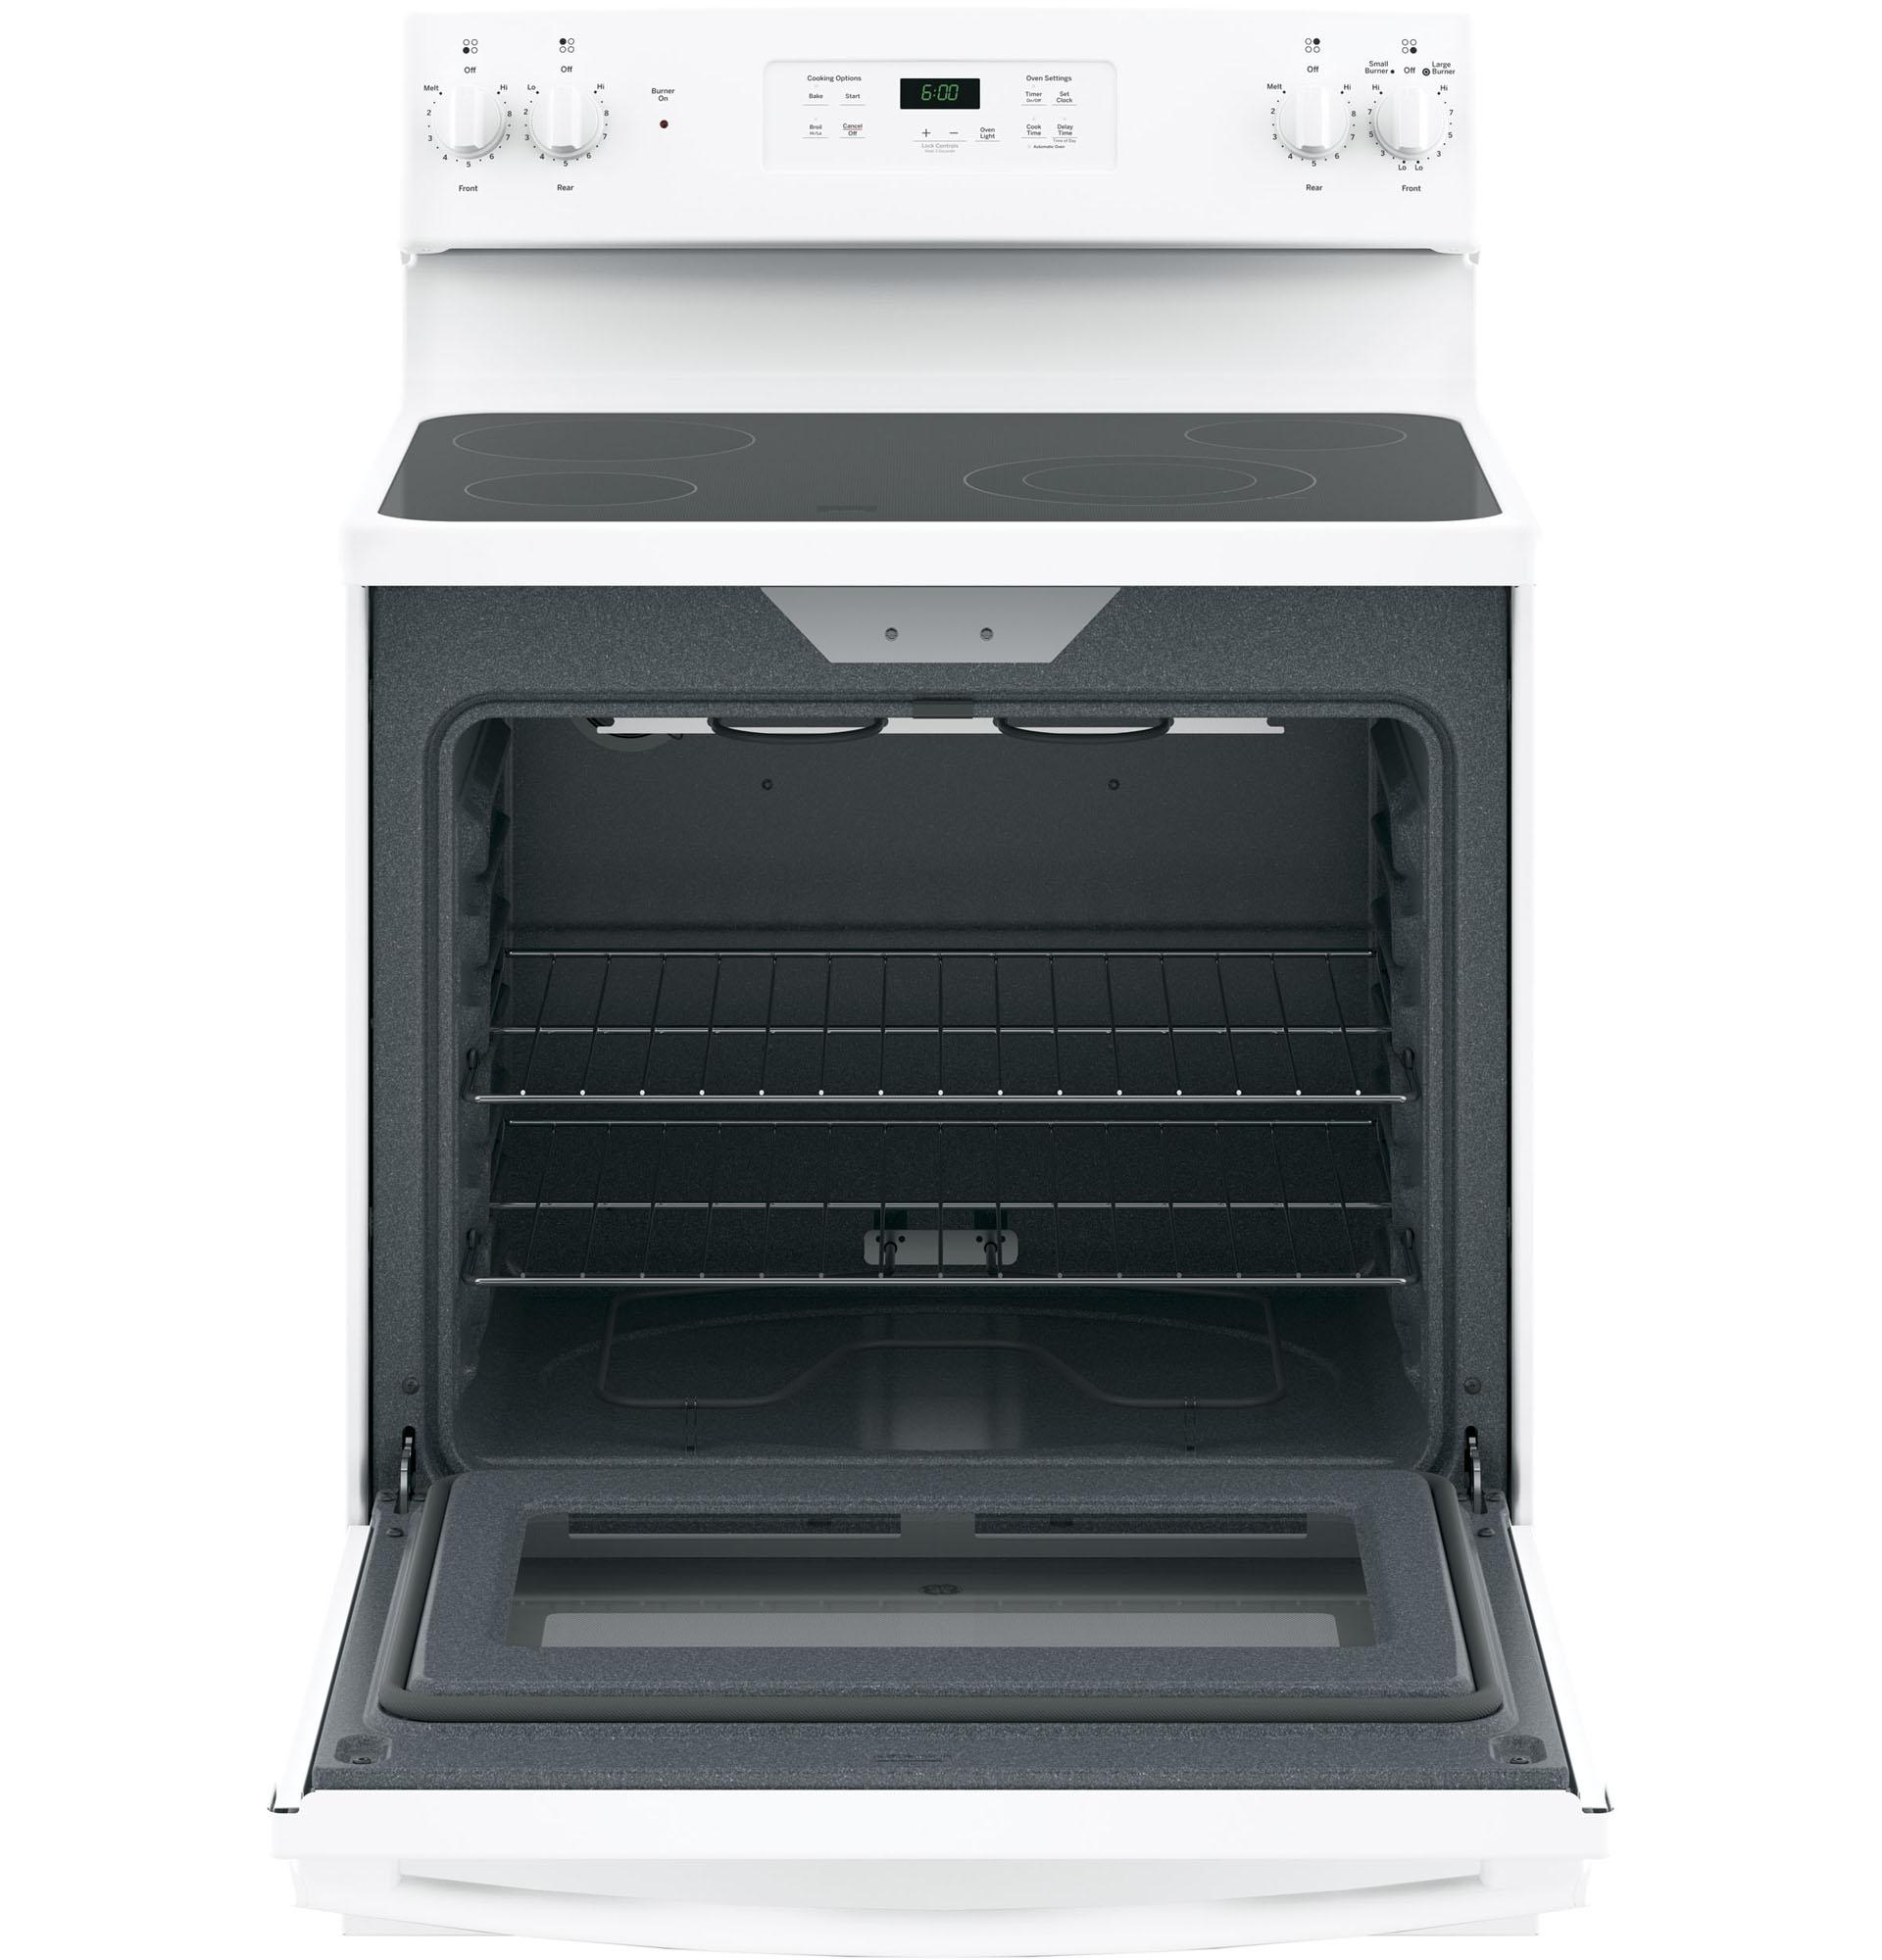 "GE Appliances JBS60DKWW 30"" Freestanding Electric Range - White"